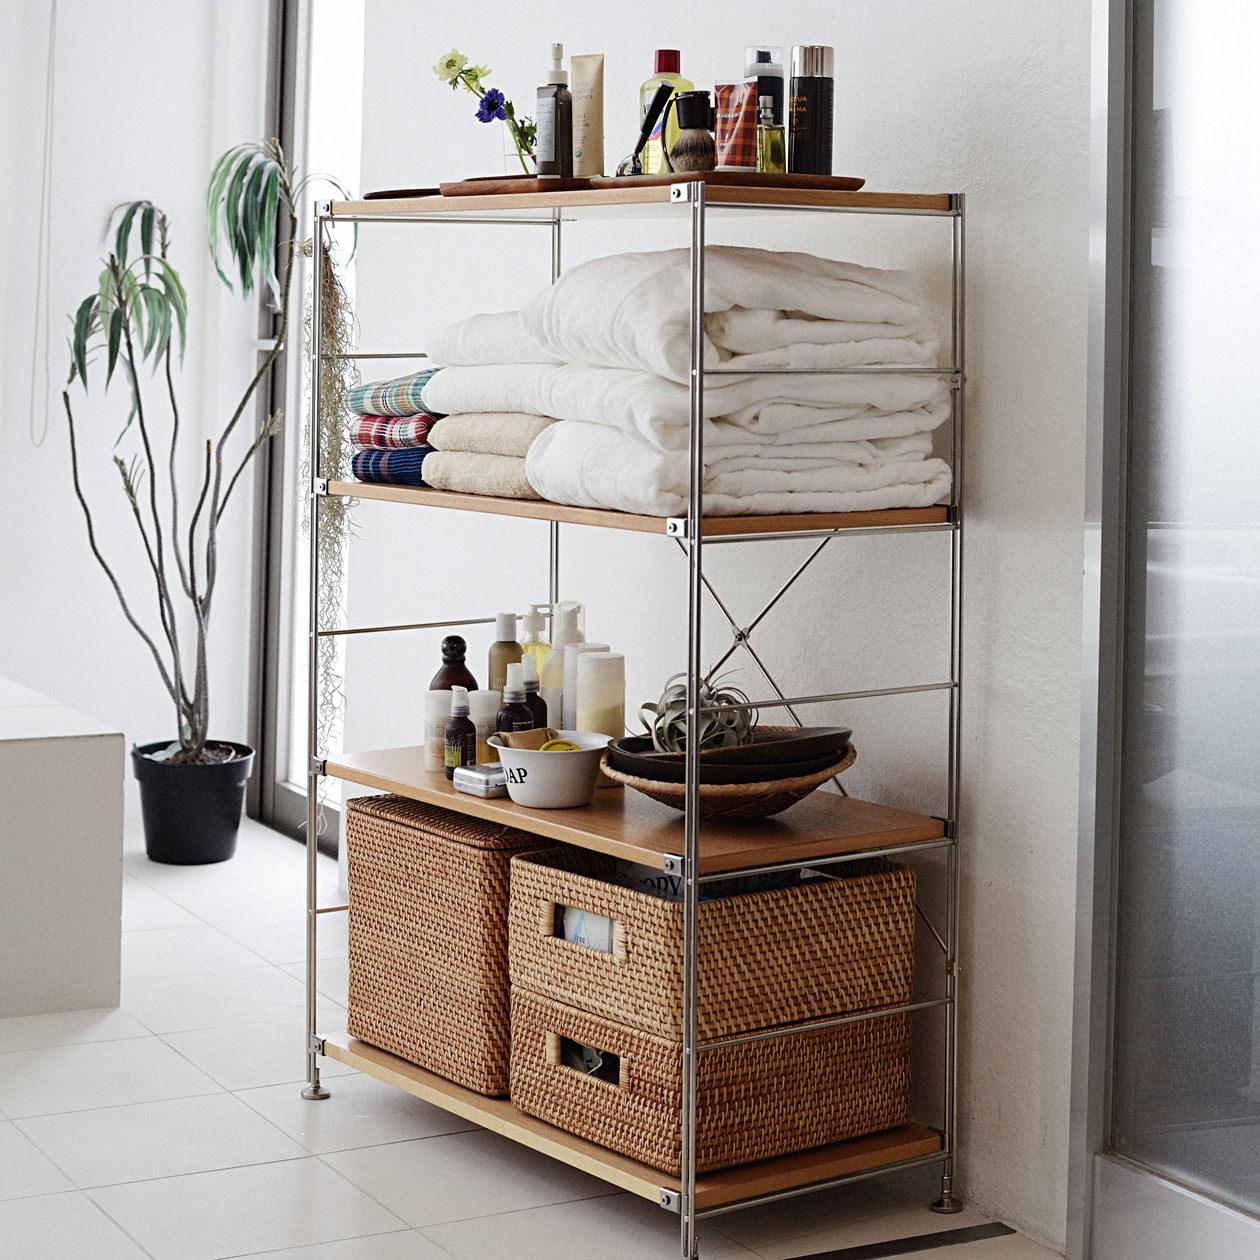 Jugar極架【高120cm】極簡日式多層ins擱板層架置物架書架浴室收